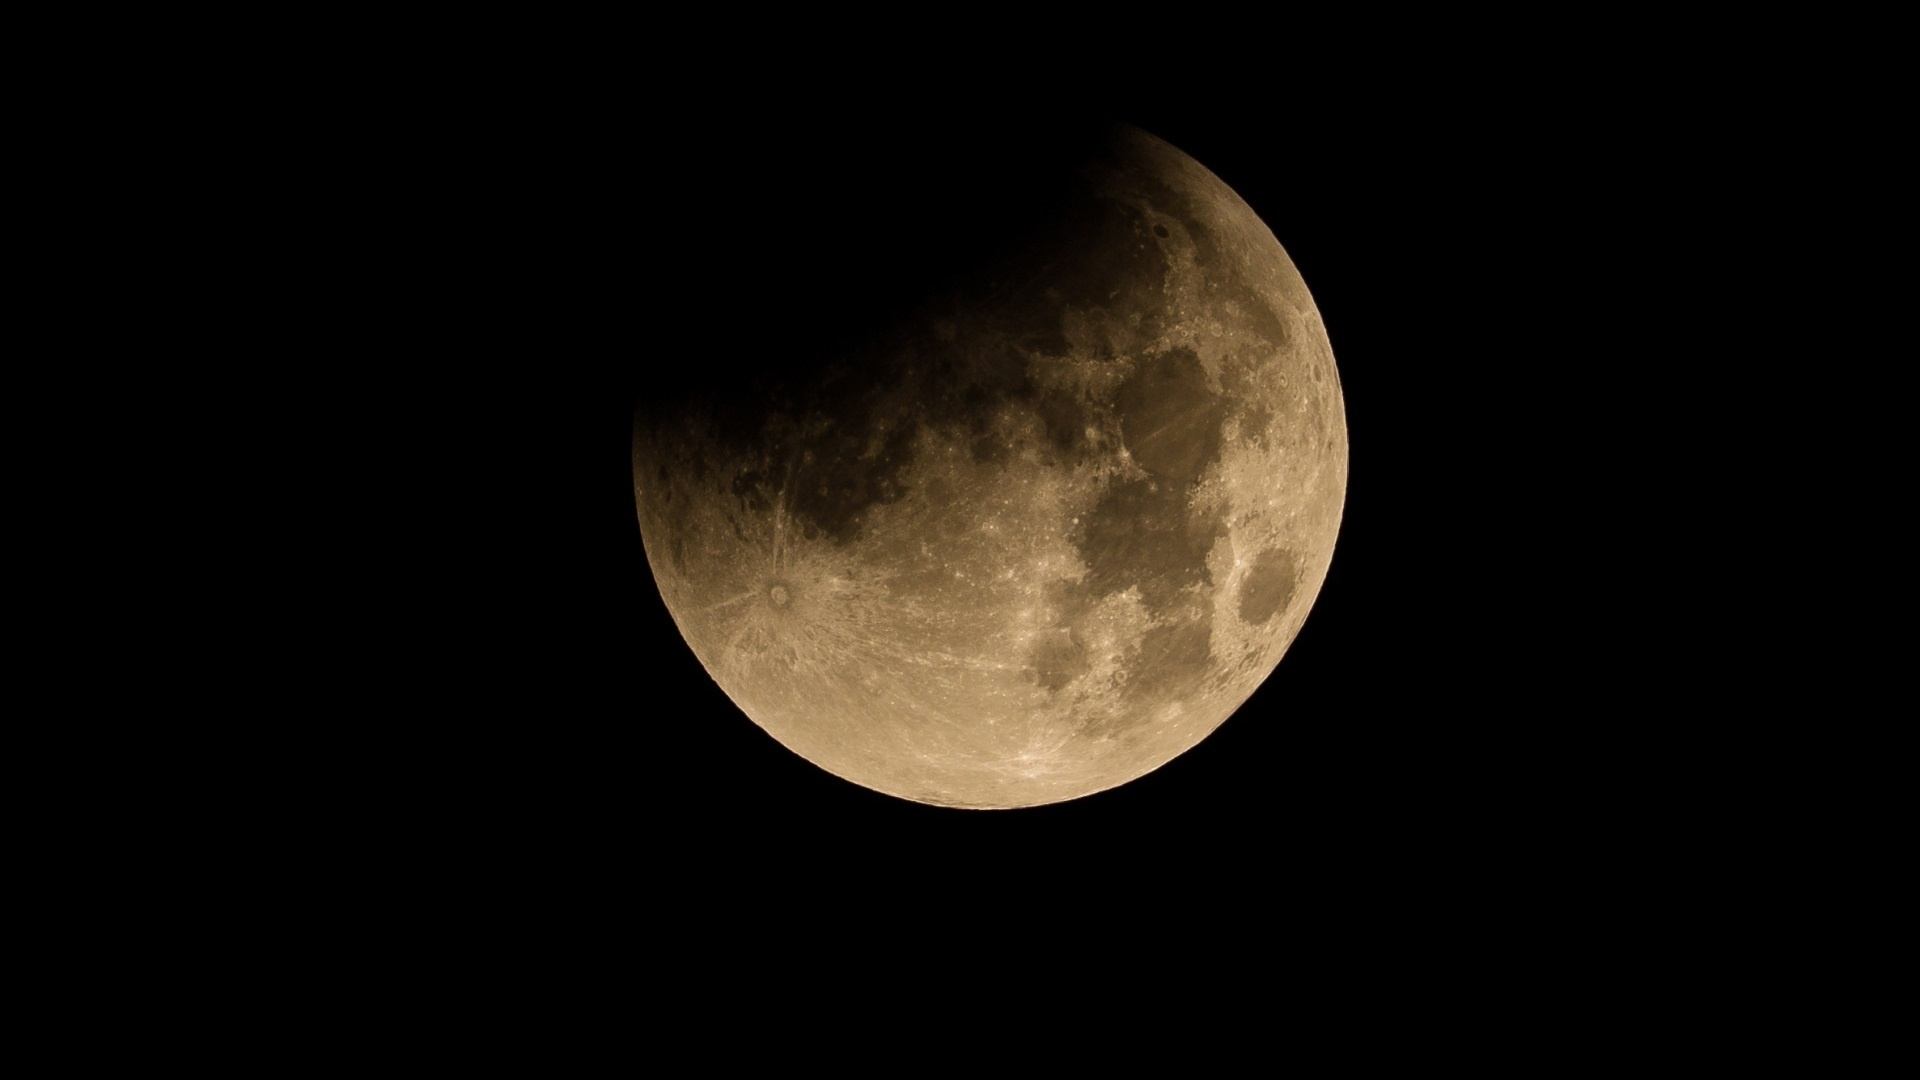 Moon Phases hd desktop wallpaper